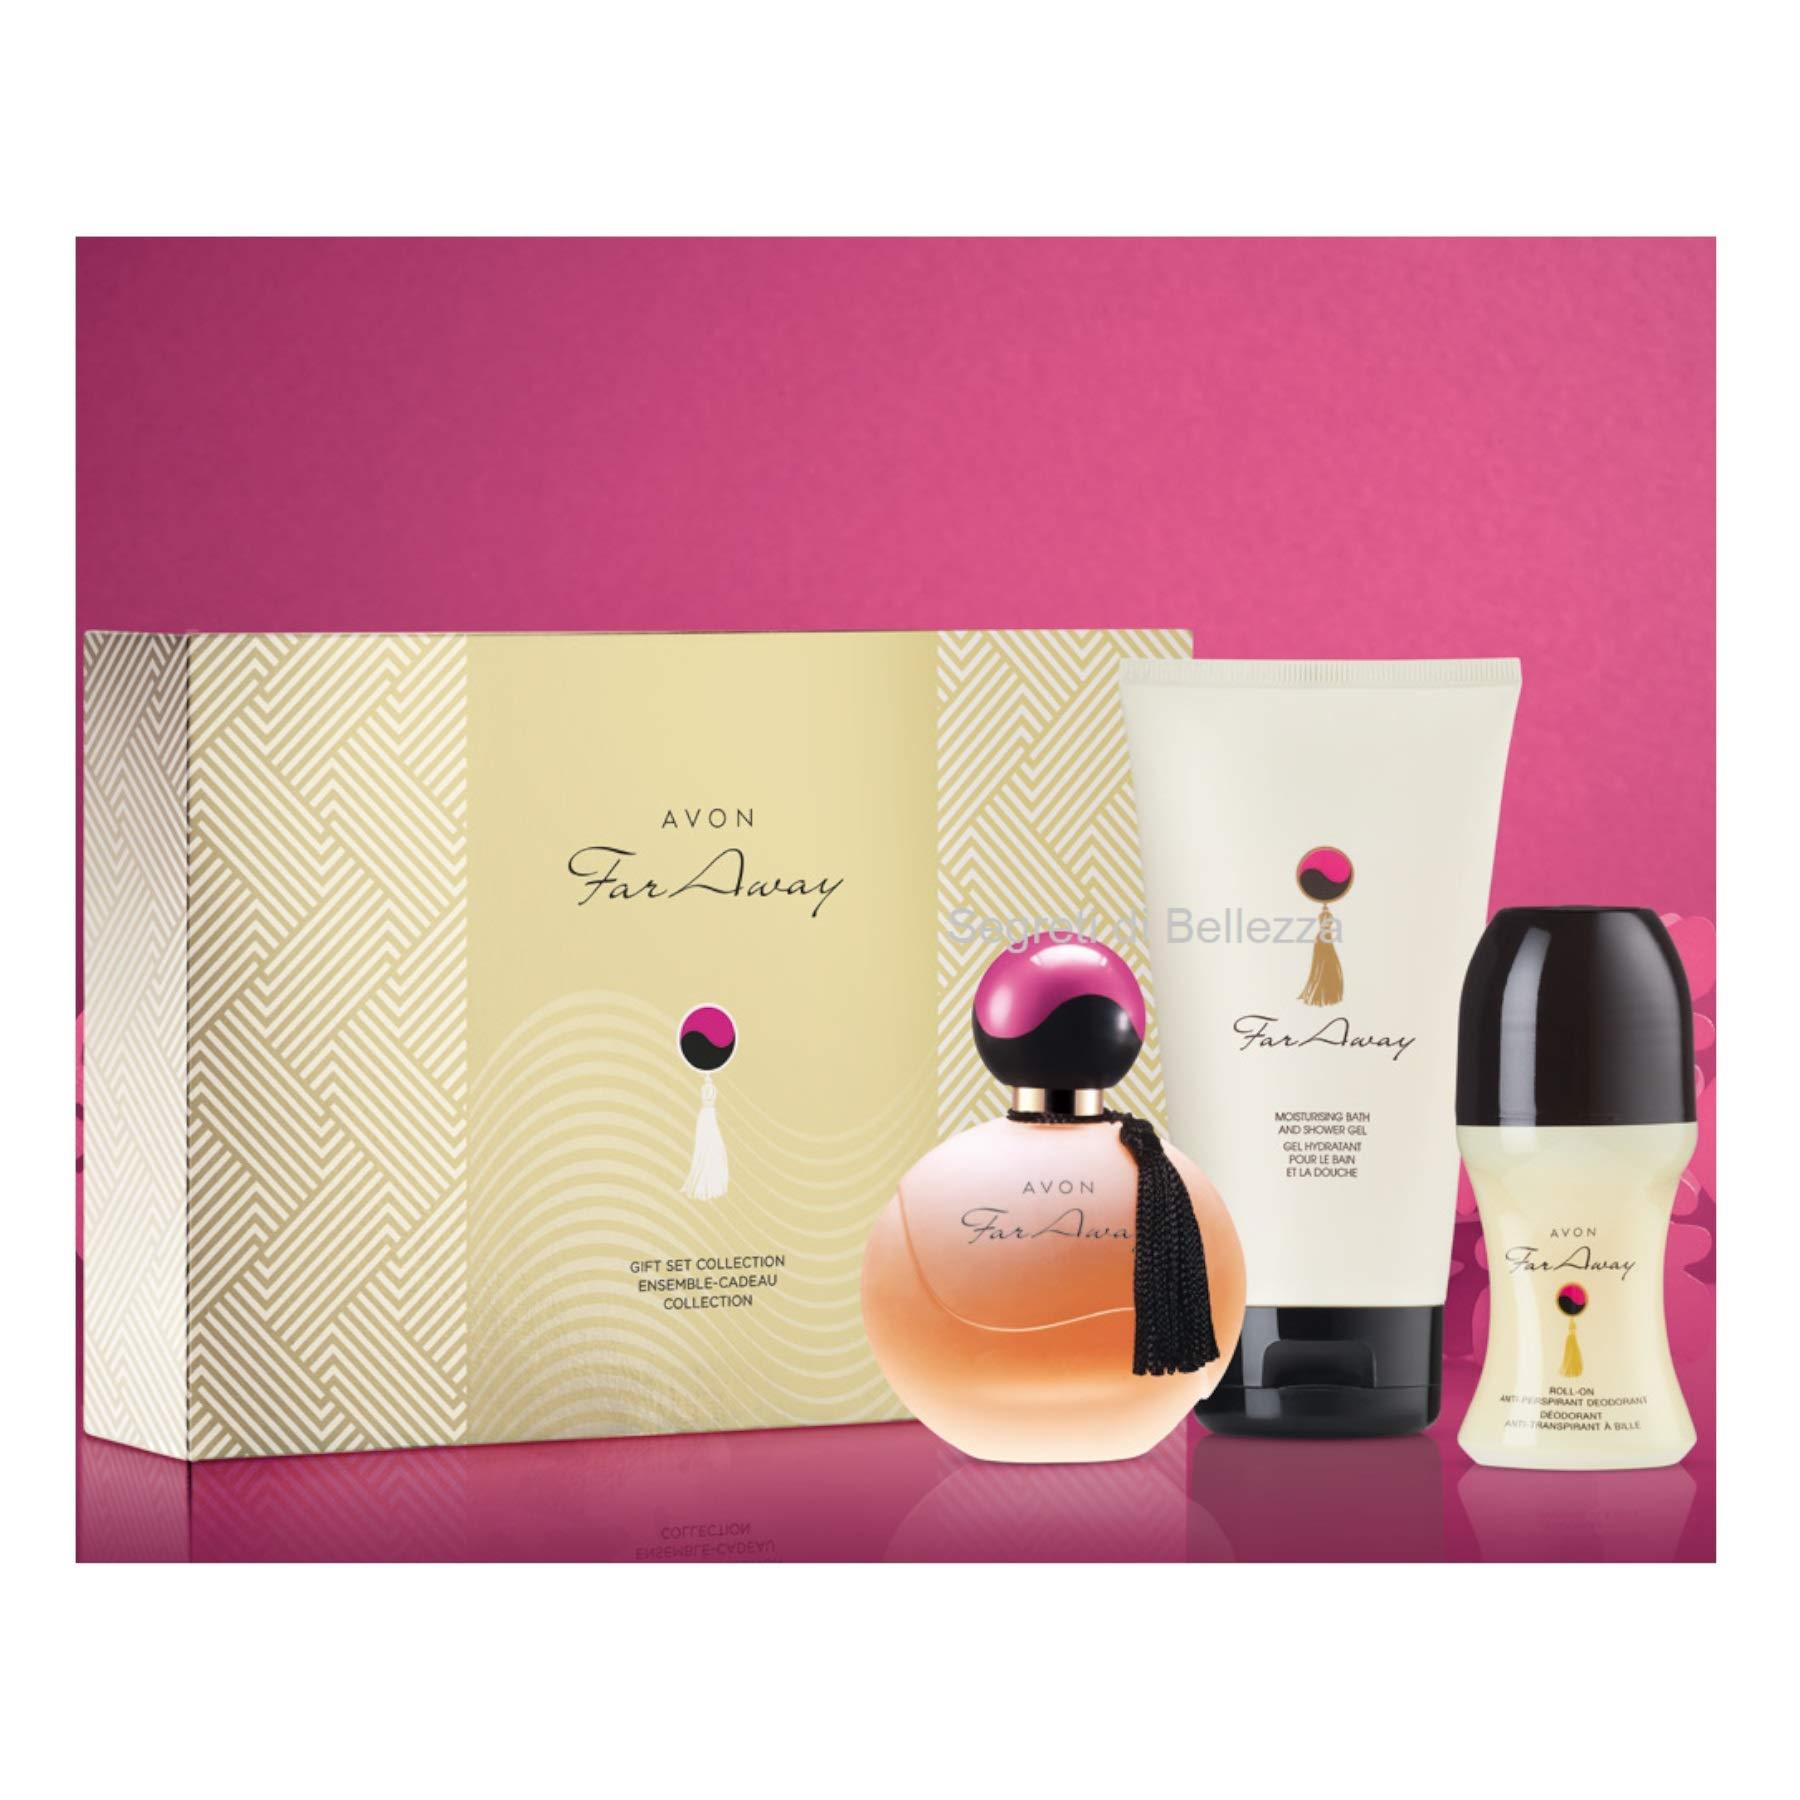 Avon Far Away Gift Collection Set | 50ml Avon Far Away EDP 150ml Body Lotion & 50ml roll on deodorant